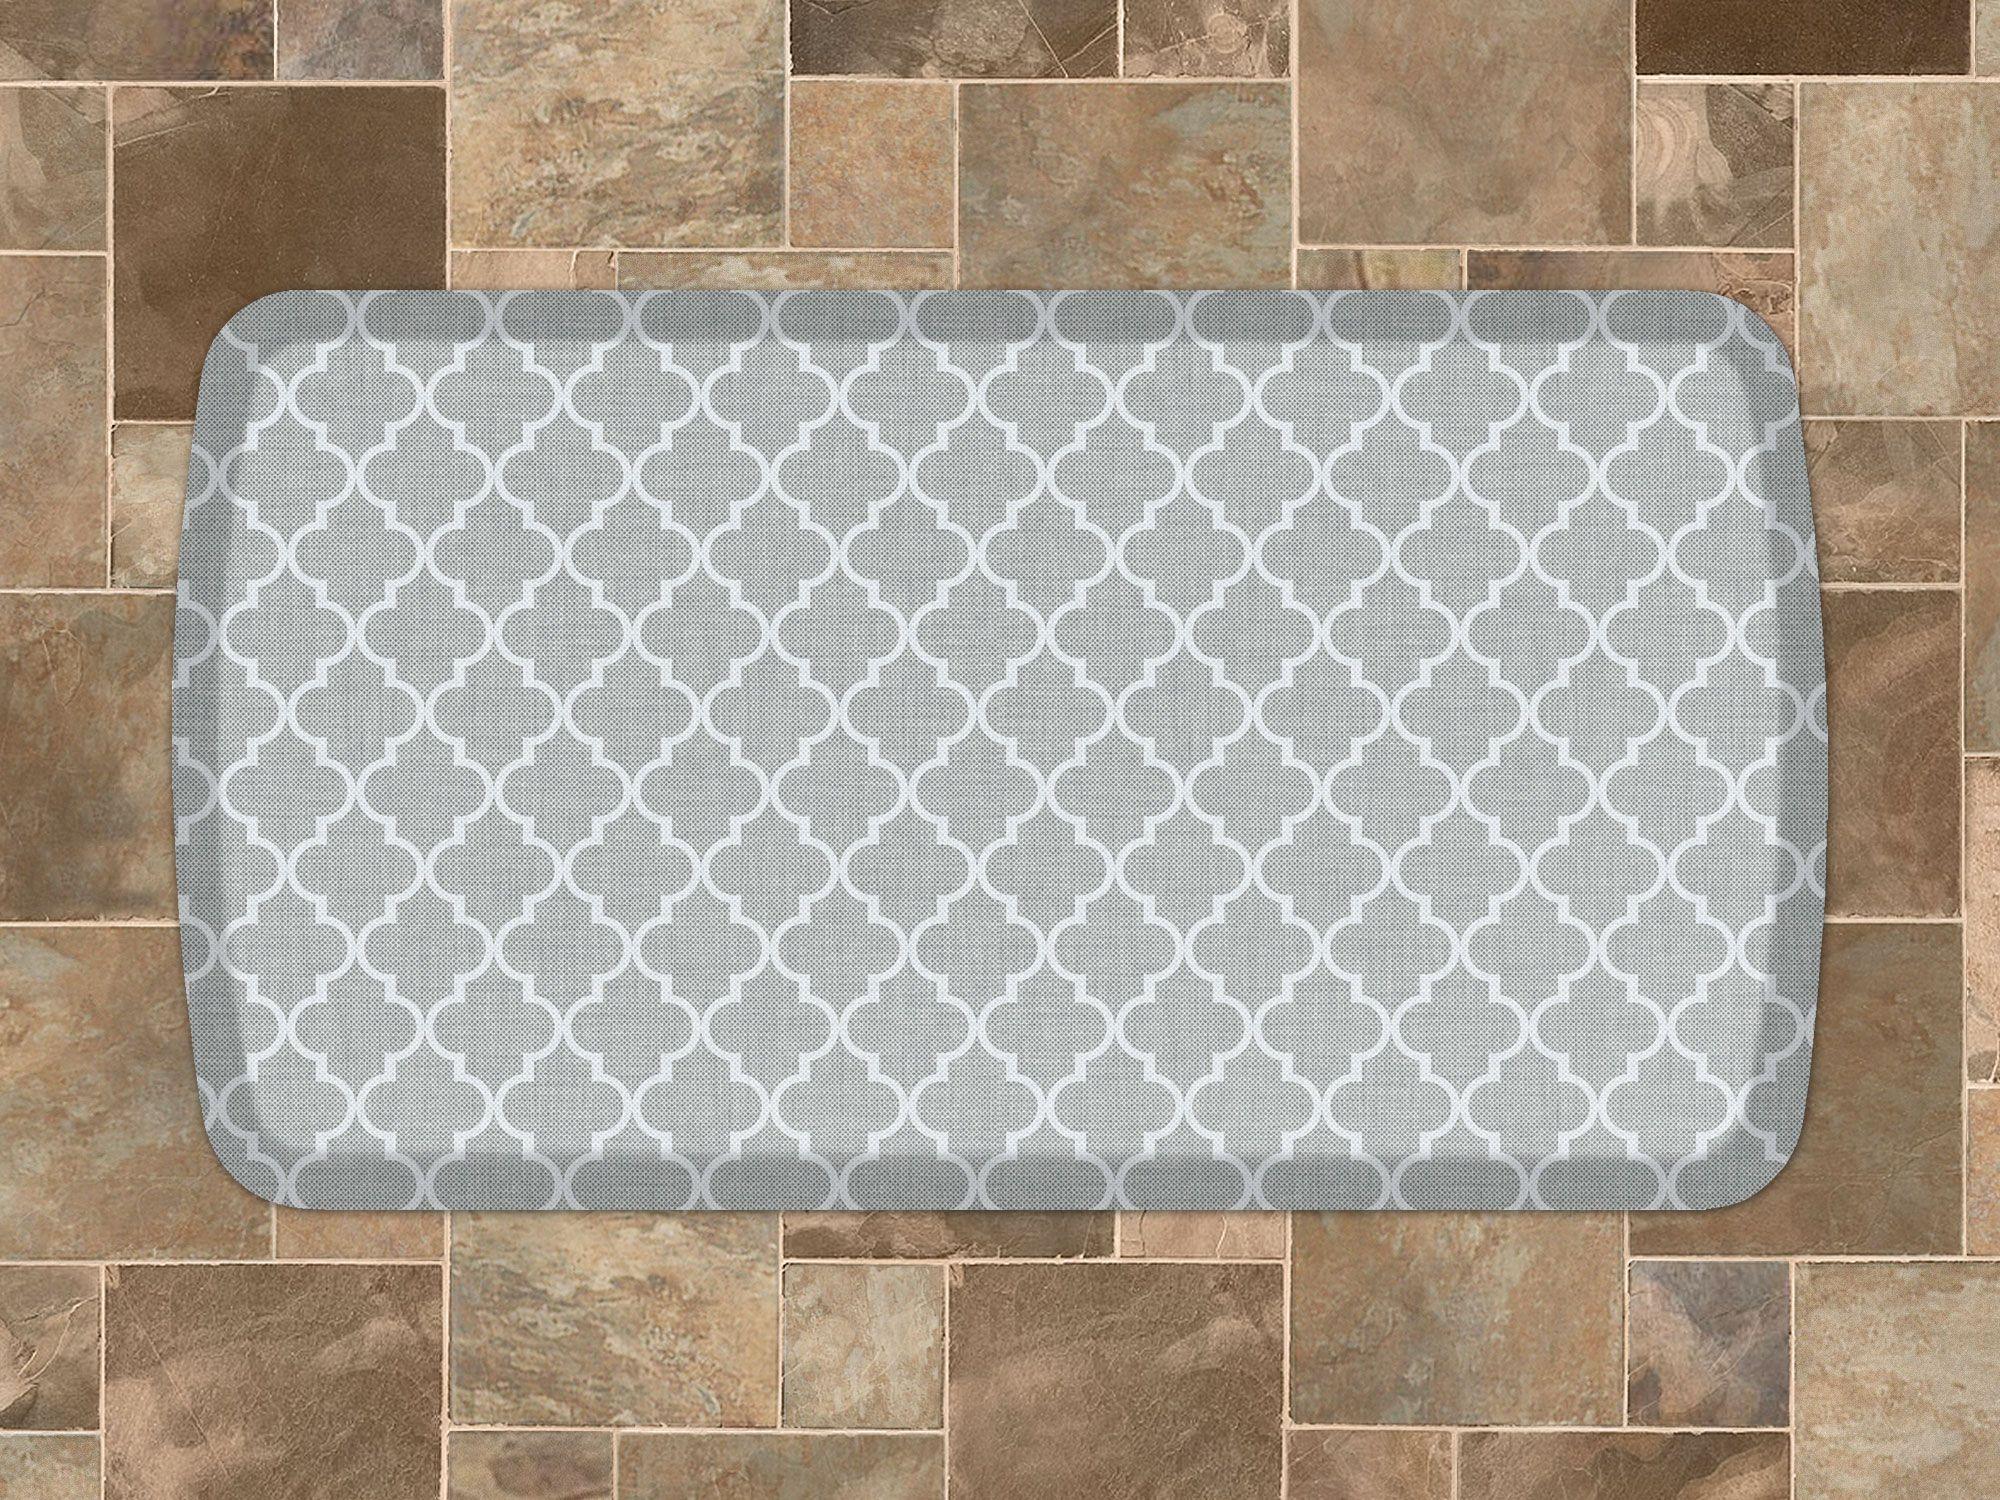 wire patterns gelpro business mat home en mats new program longer designer images launches comfort news businesswire monogram